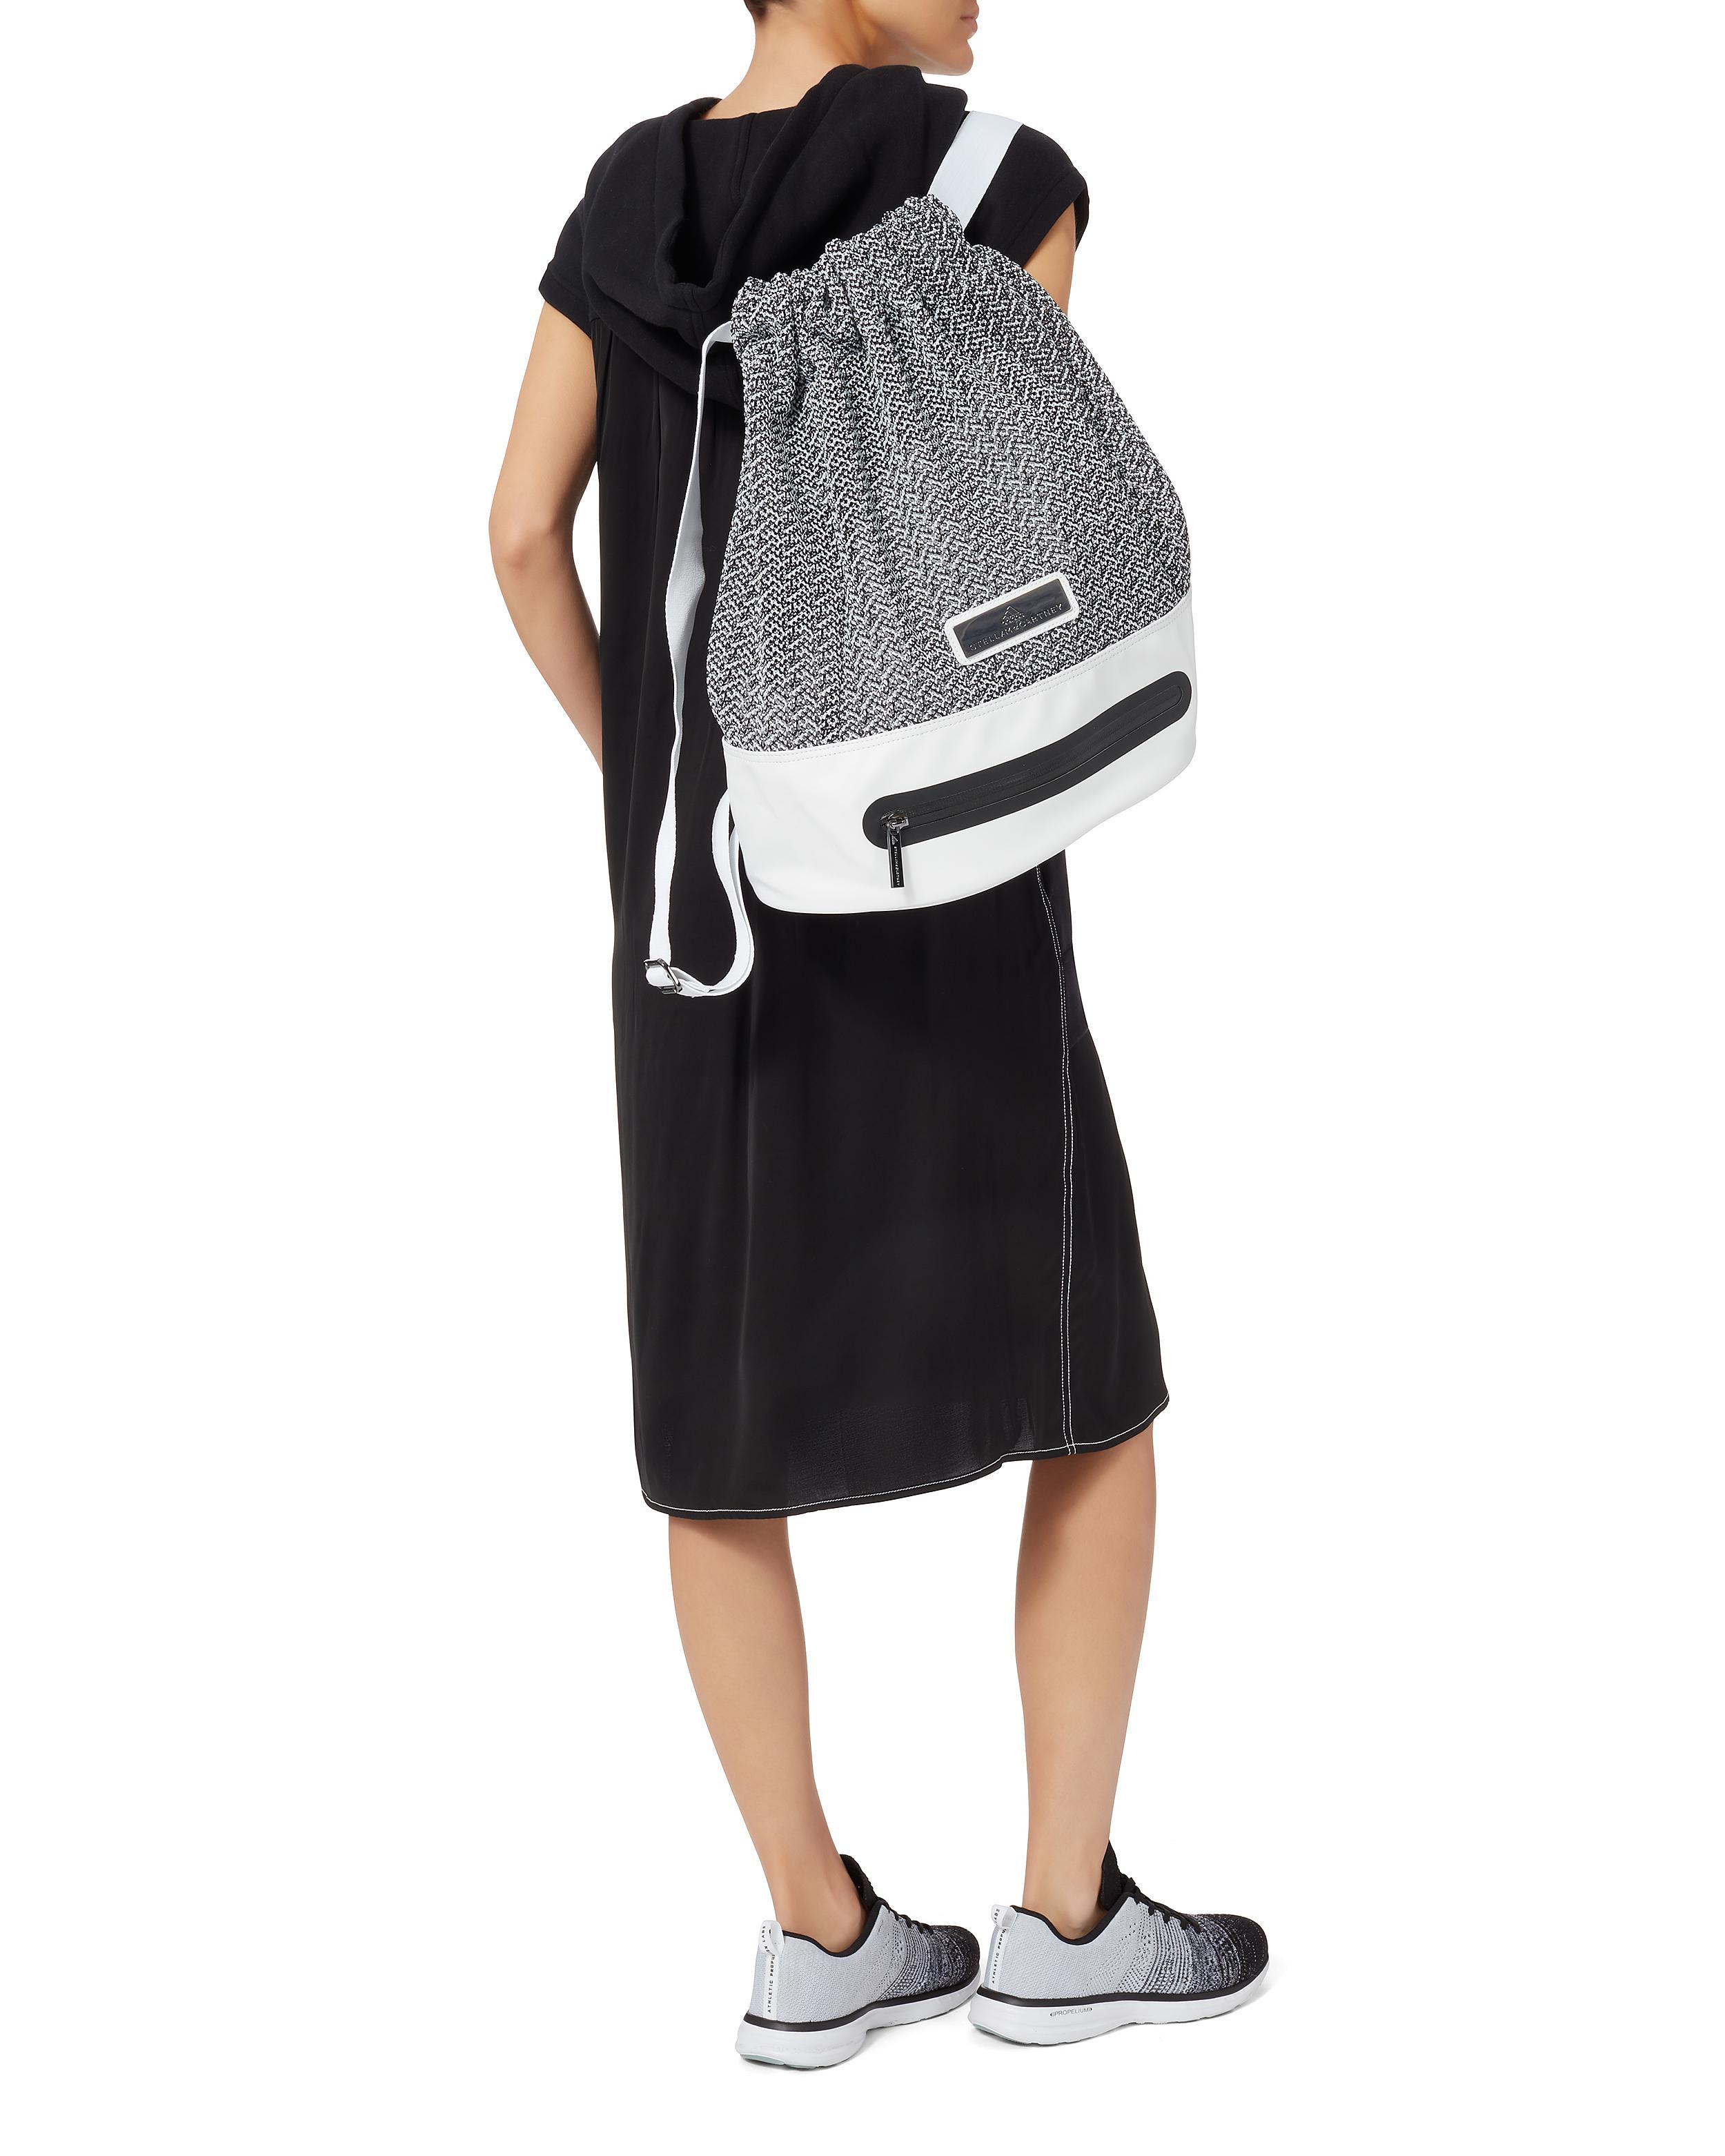 1ff2baf4bbf Adidas By Stella McCartney White Knit Backpack